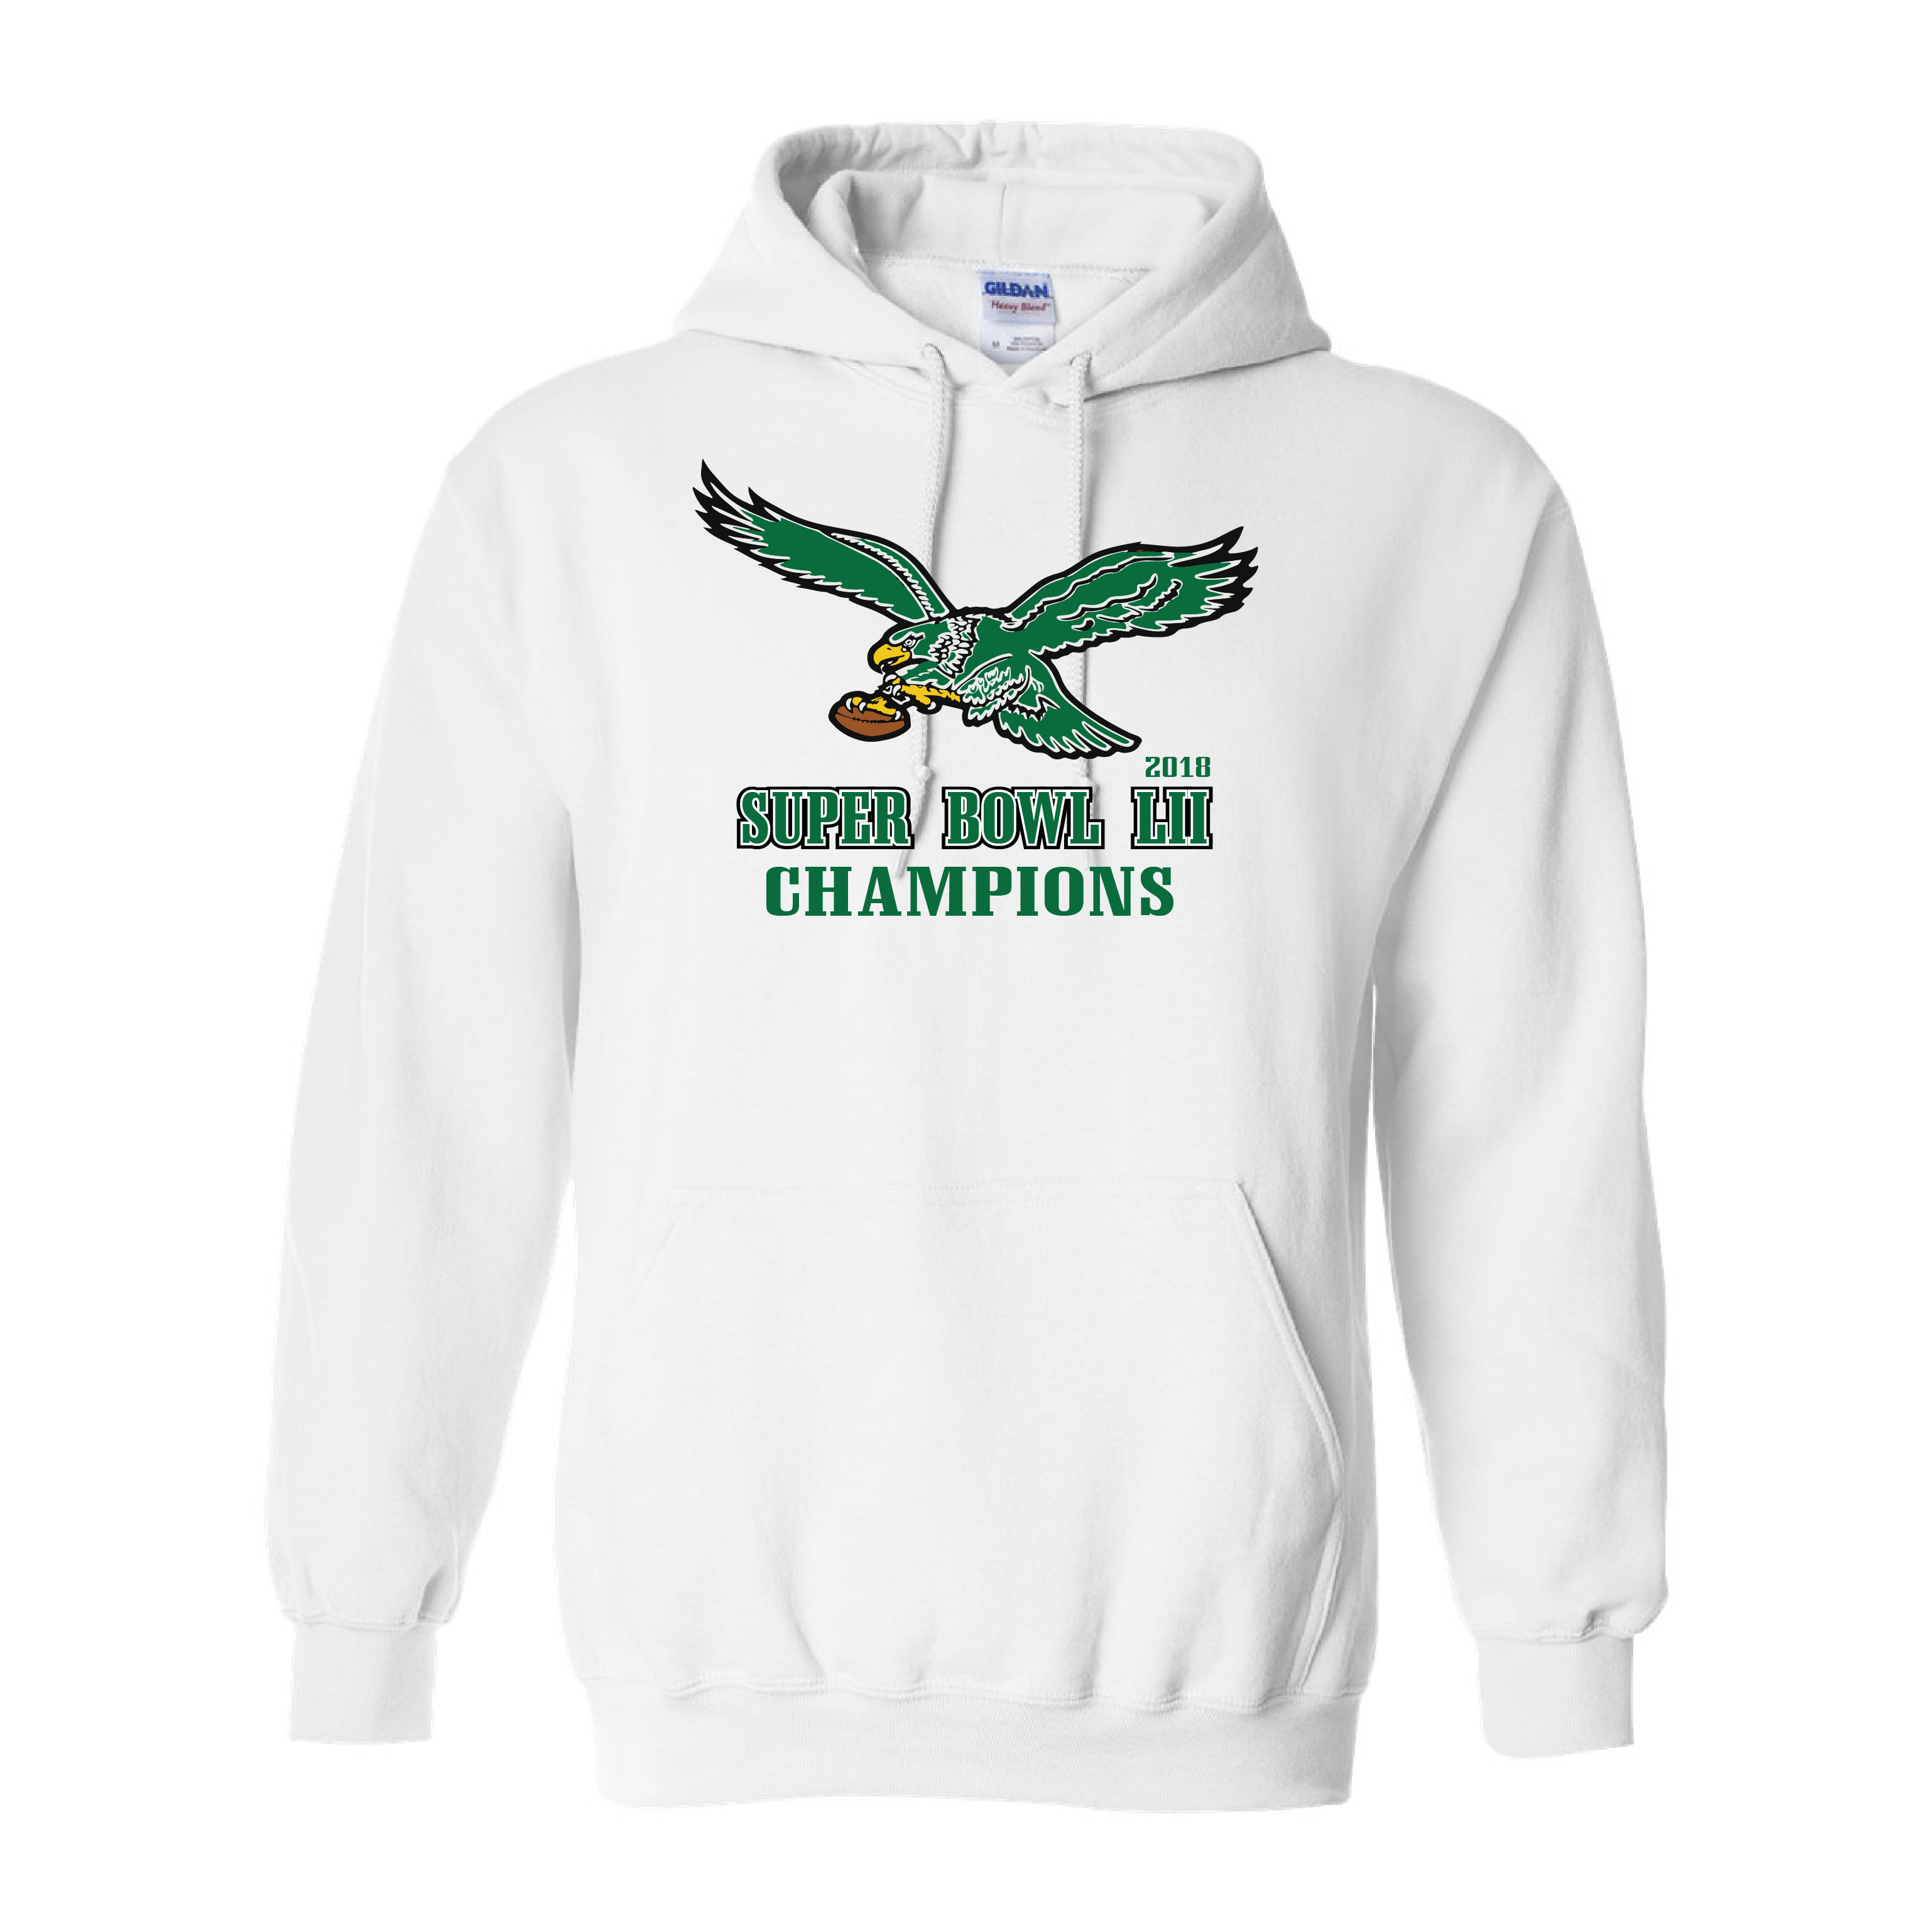 half off 5a12c 571bf Philadelphia Eagles - Super Bowl LII Champions Vintage Style Hooded  Sweatshirt